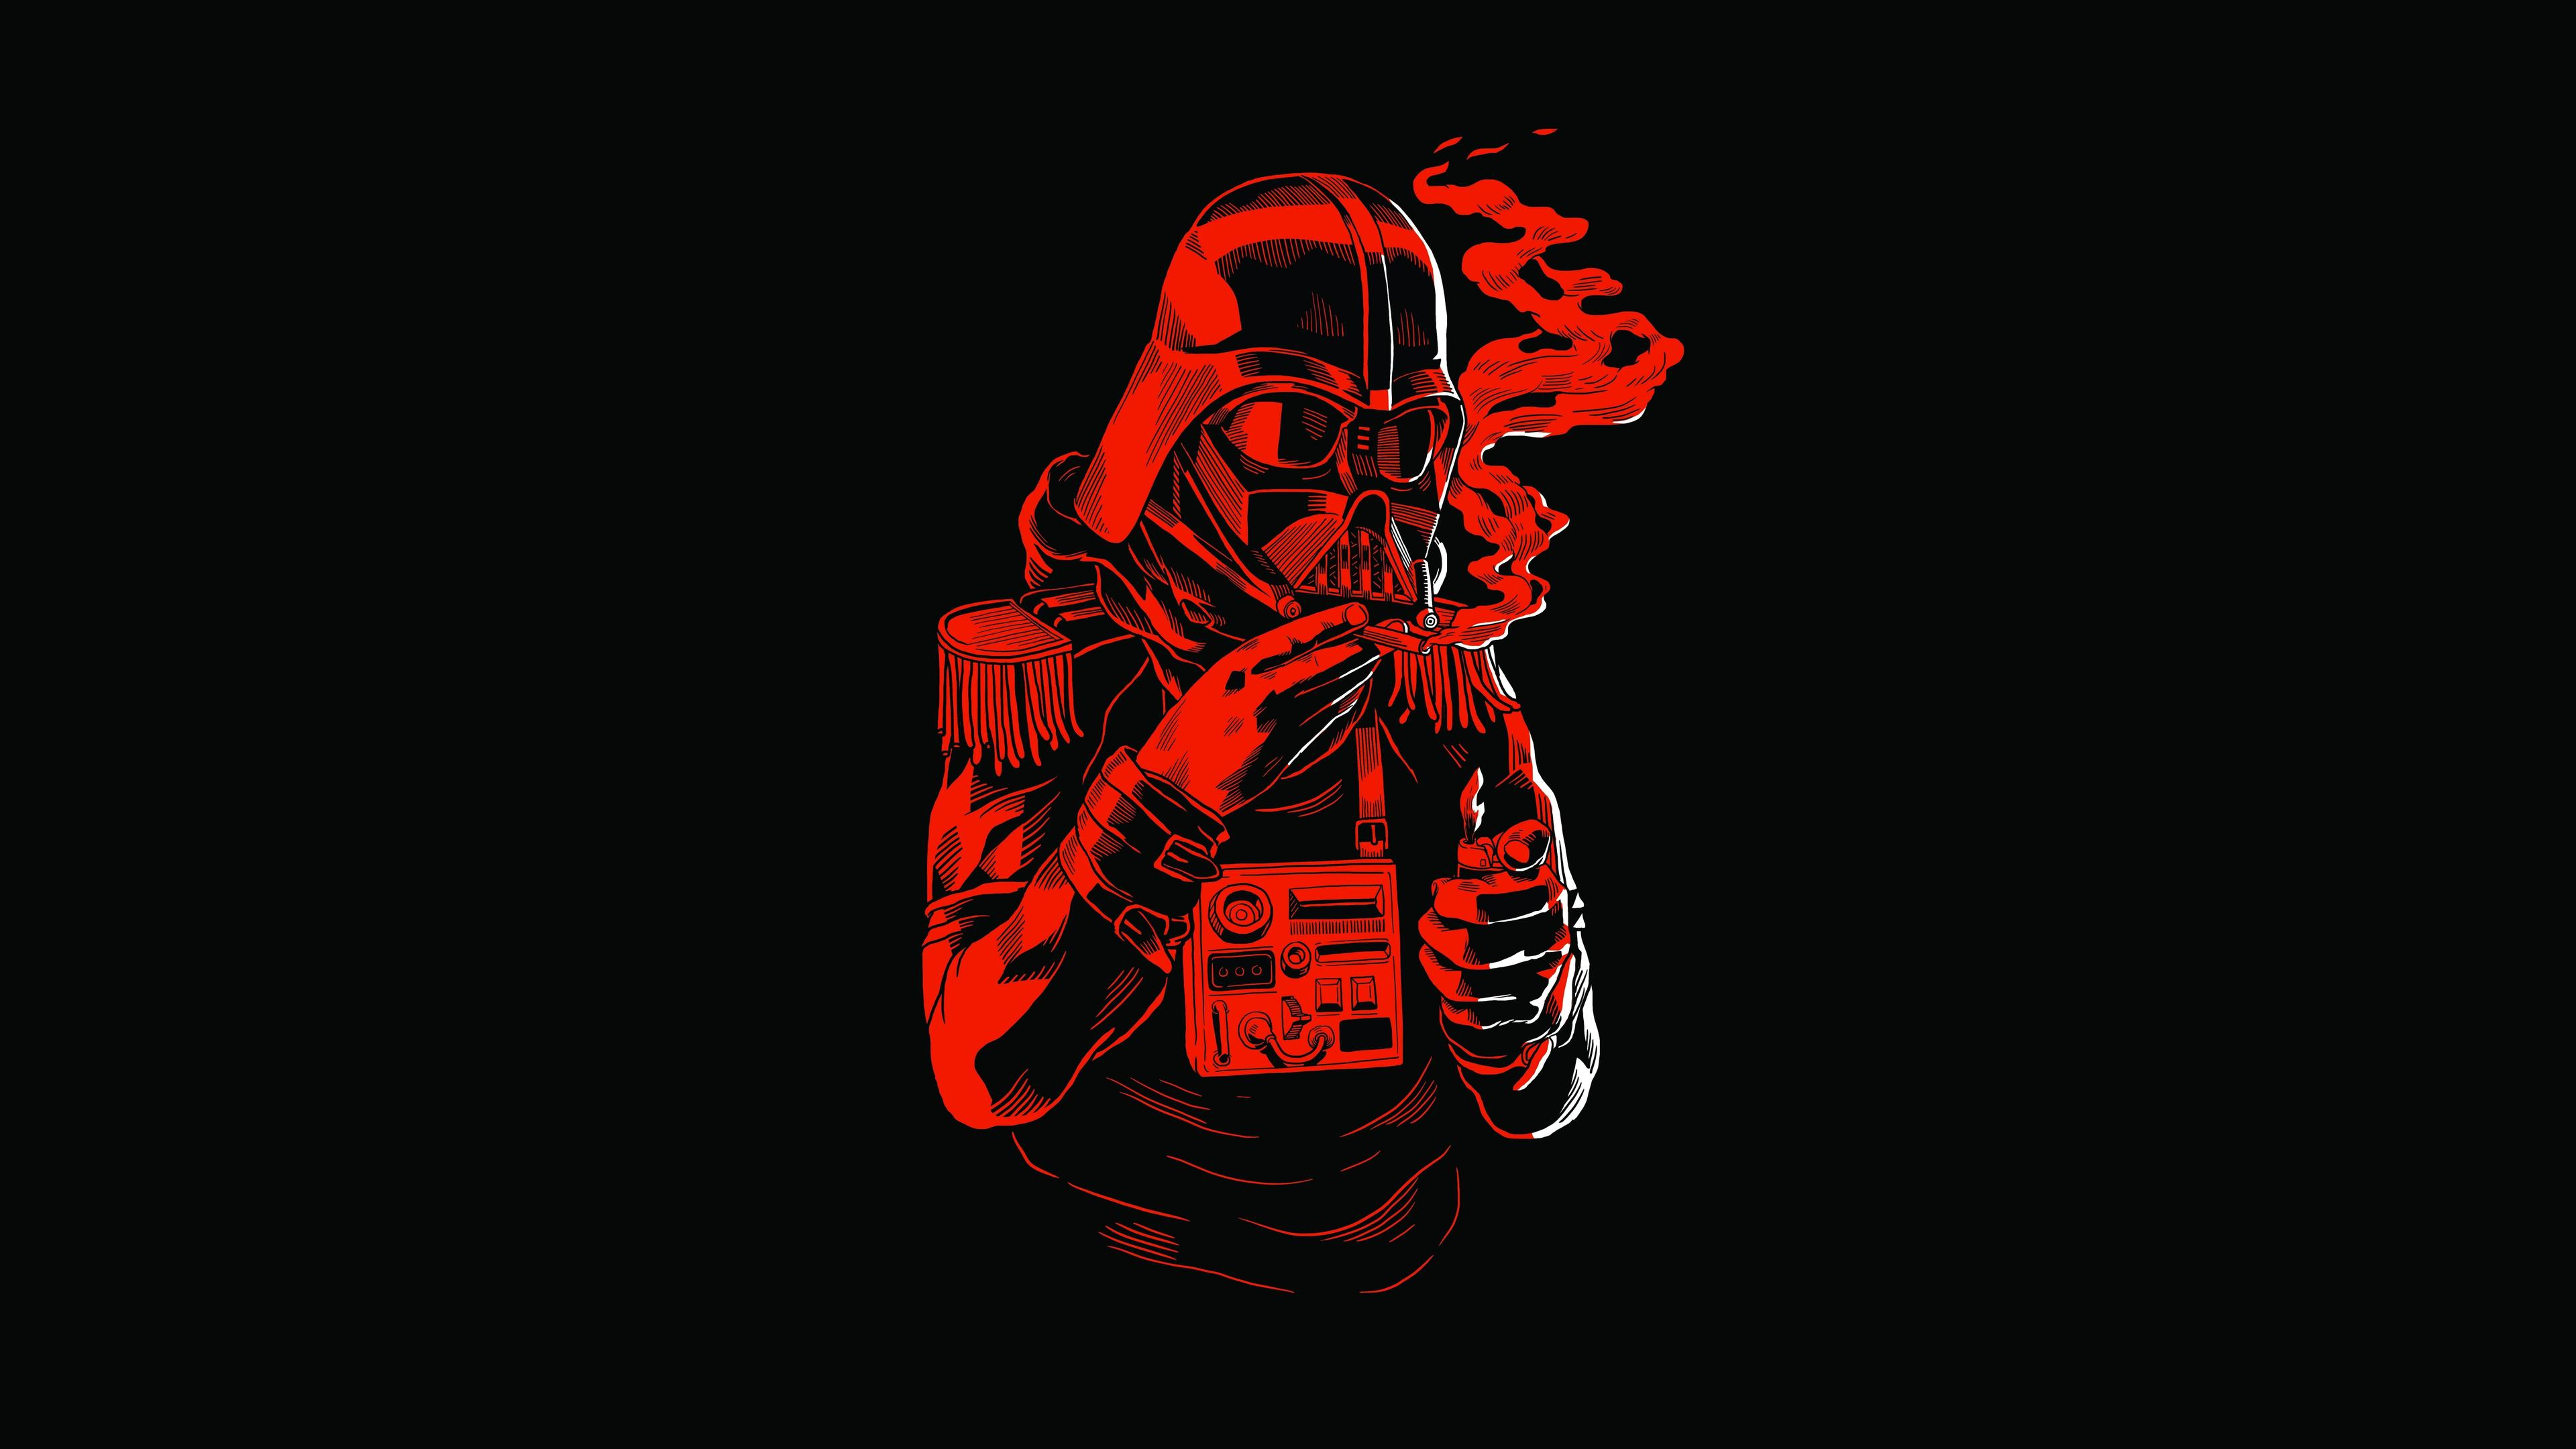 star wars dark red 8k 1541719442 - Star Wars Dark Red 8k - star wars wallpapers, red wallpapers, movies wallpapers, hd-wallpapers, dark wallpapers, 8k wallpapers, 5k wallpapers, 4k-wallpapers